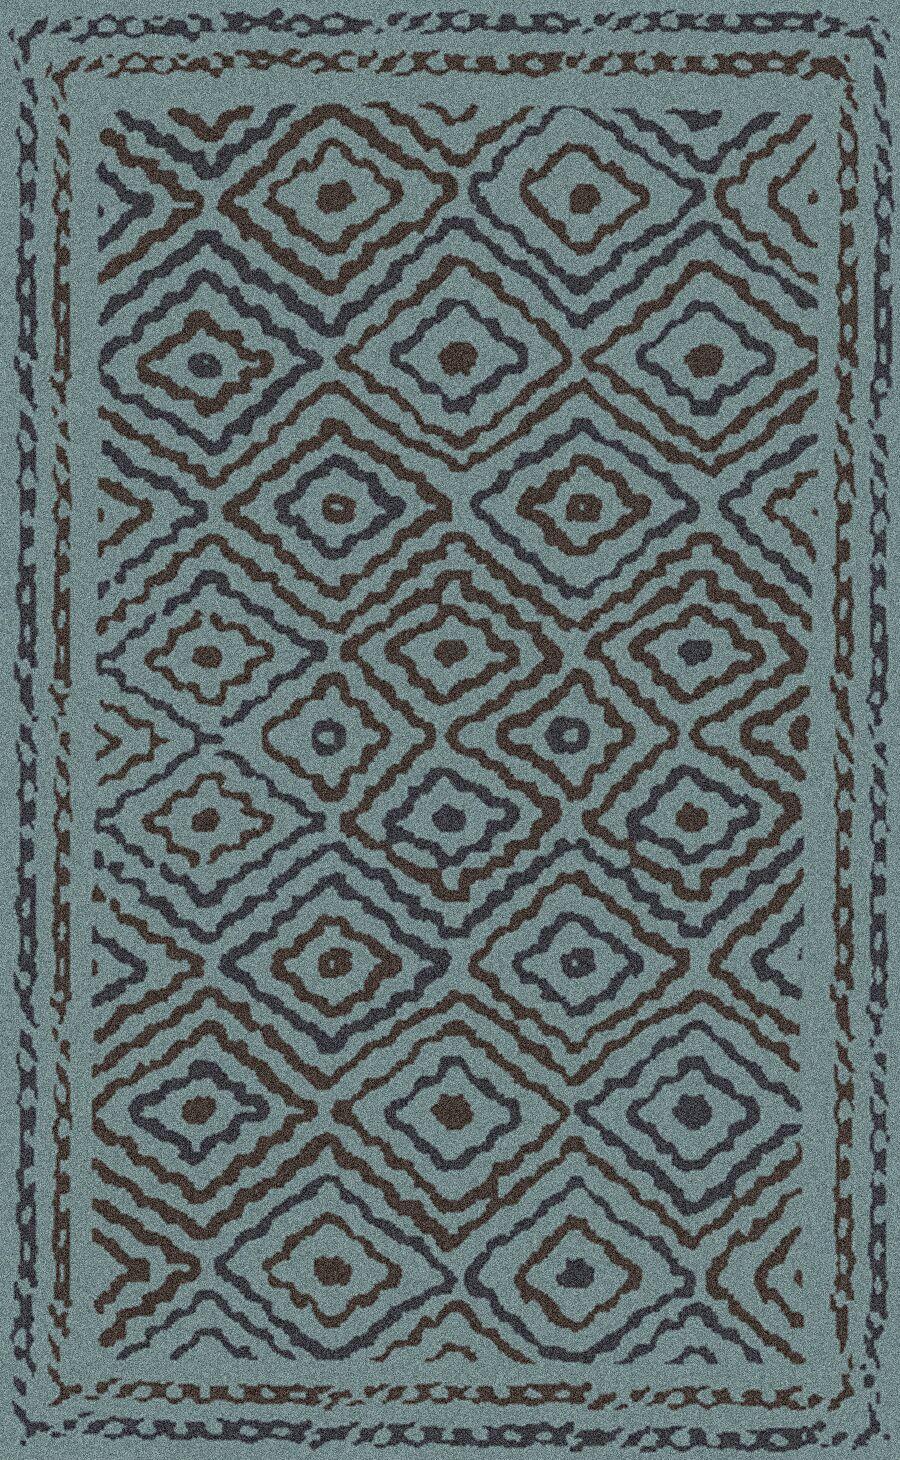 Sala Teal Area Rug Rug Size: Rectangle 8' x 11'